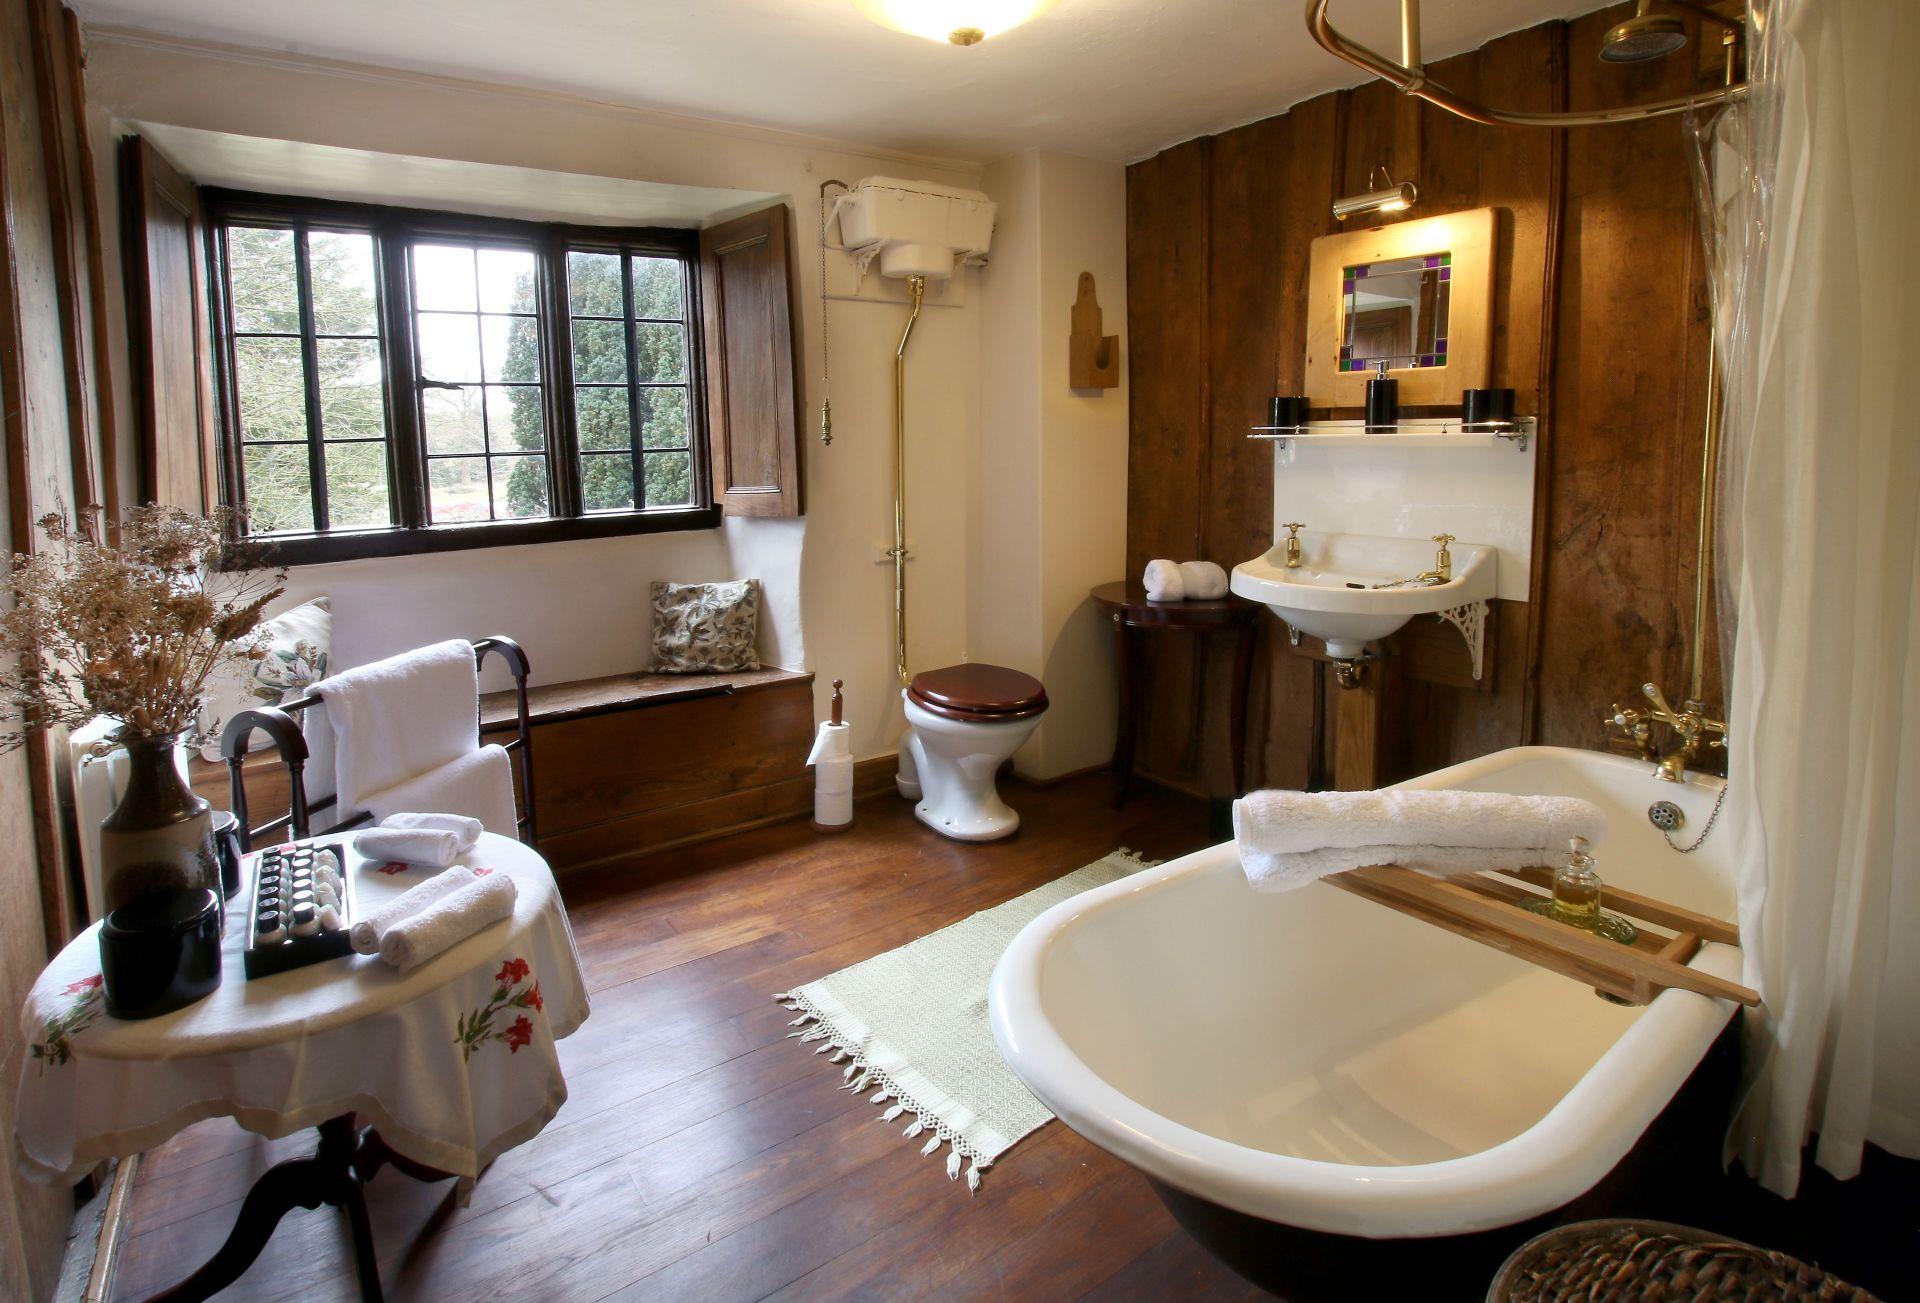 First floor:  Adjacent bathroom with claw foot bath and overhead rain shower